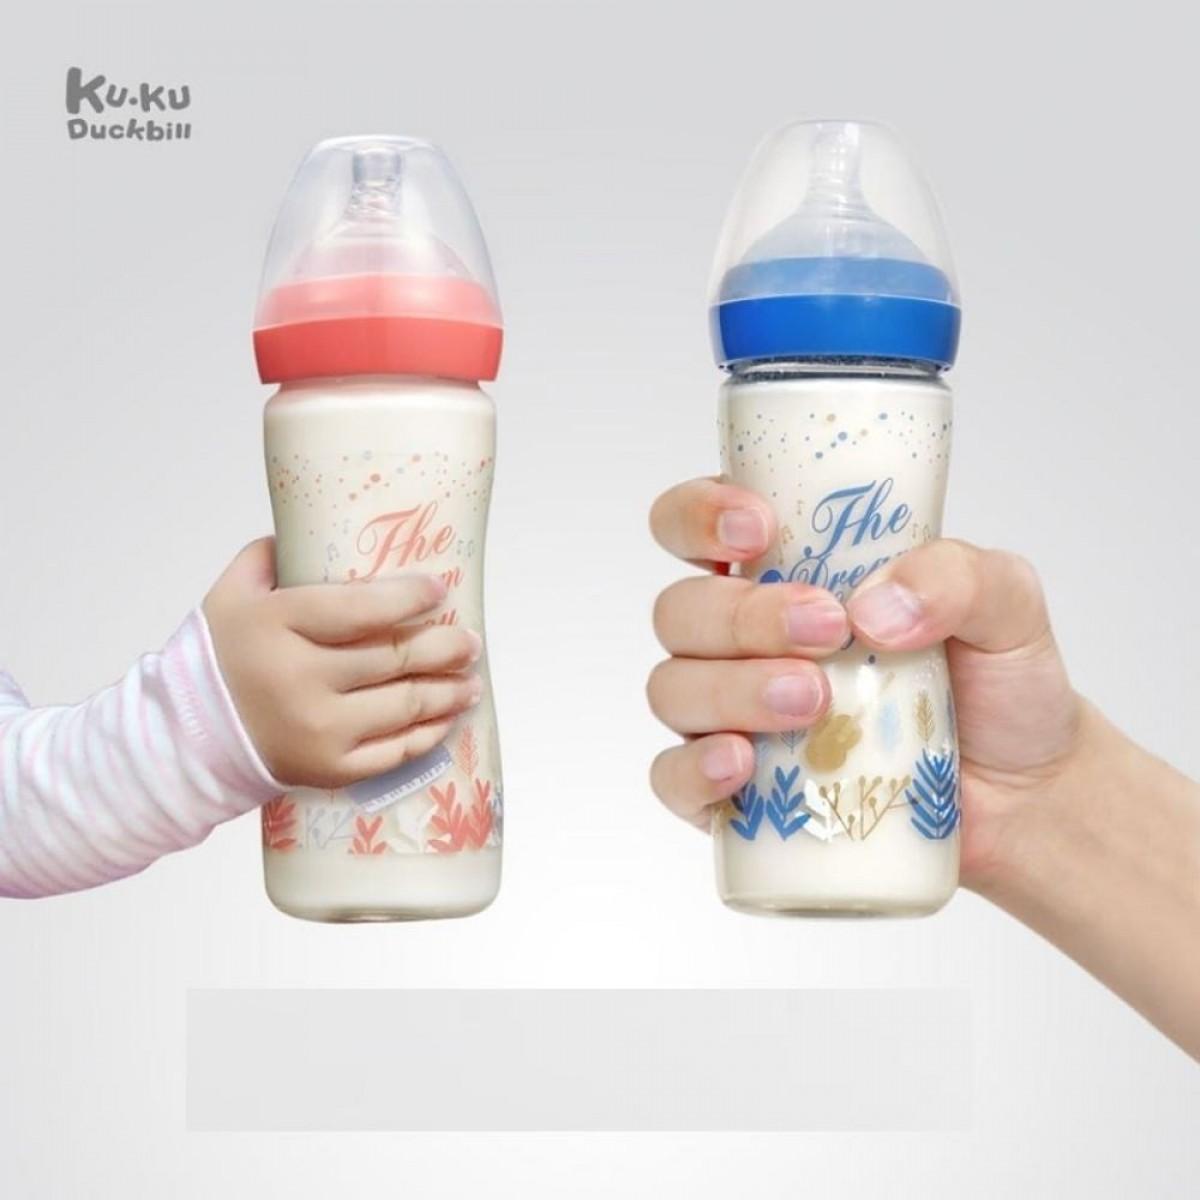 Kuku Duckbill Glass Bottle 150ml/240ml (Dark Blue / Pink) - The Dream of You